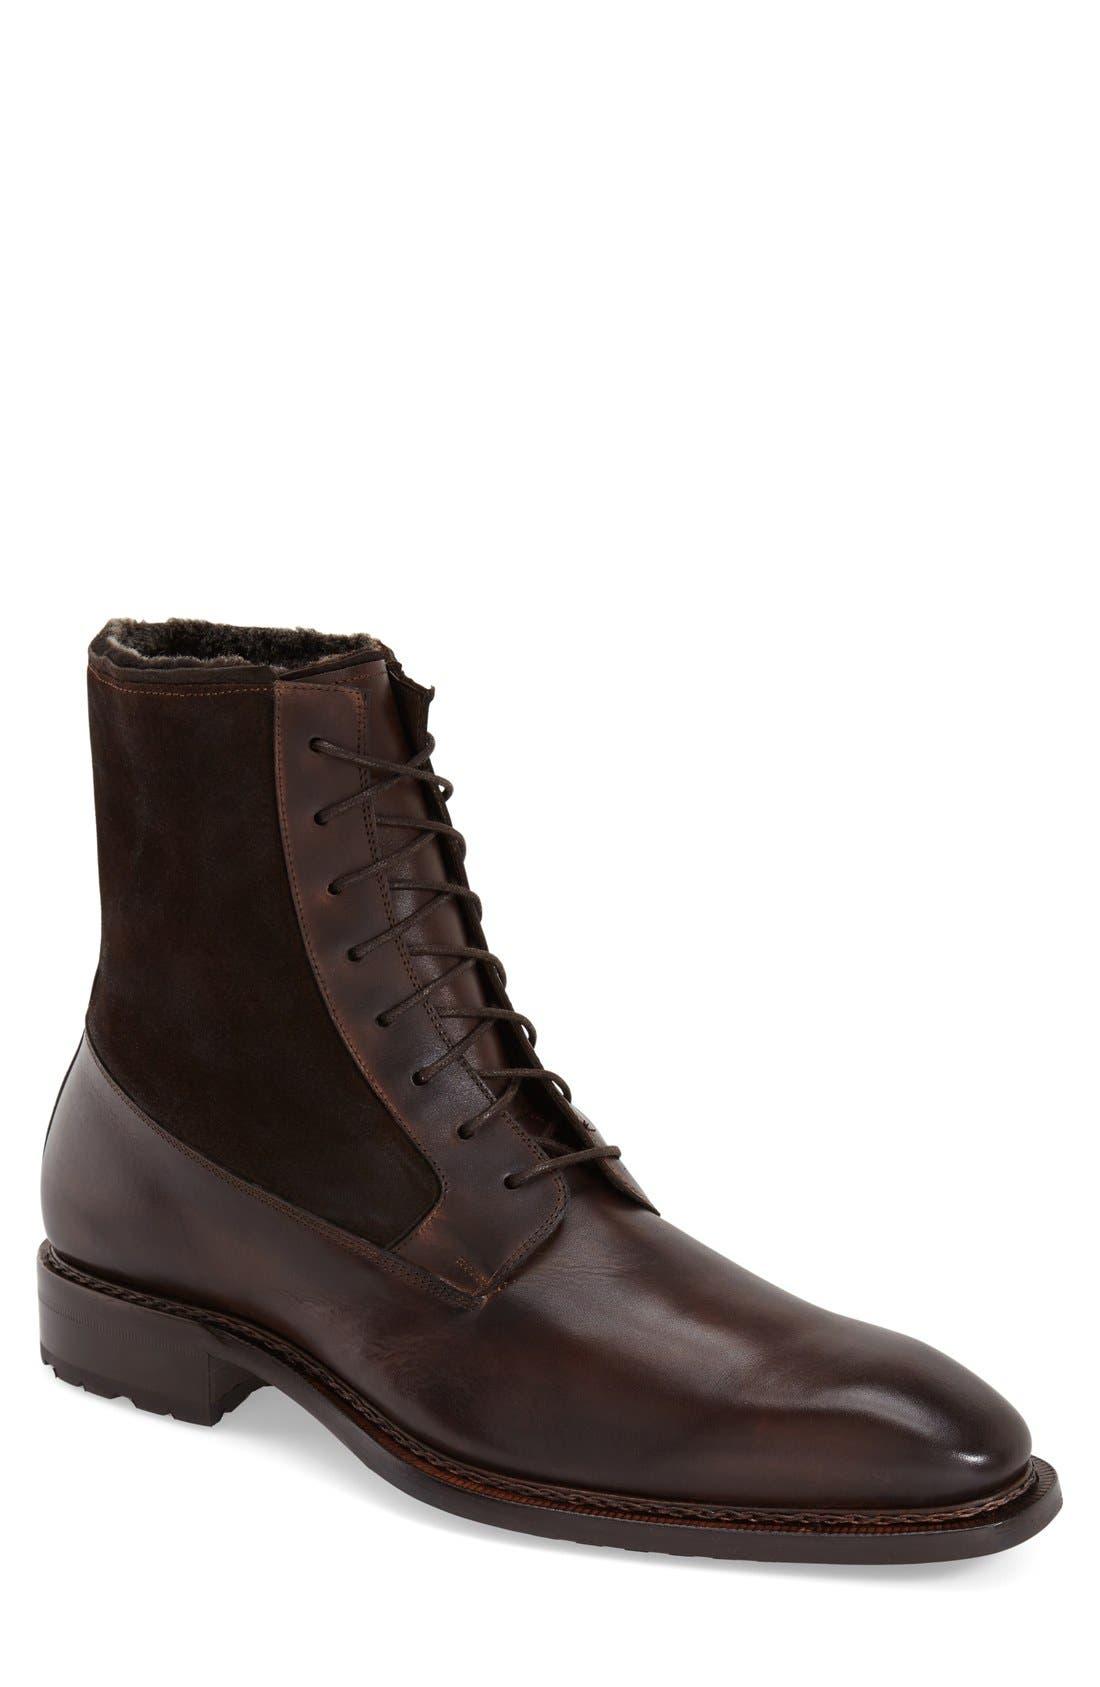 'Luzern' Genuine Shearling Boot,                         Main,                         color, 200